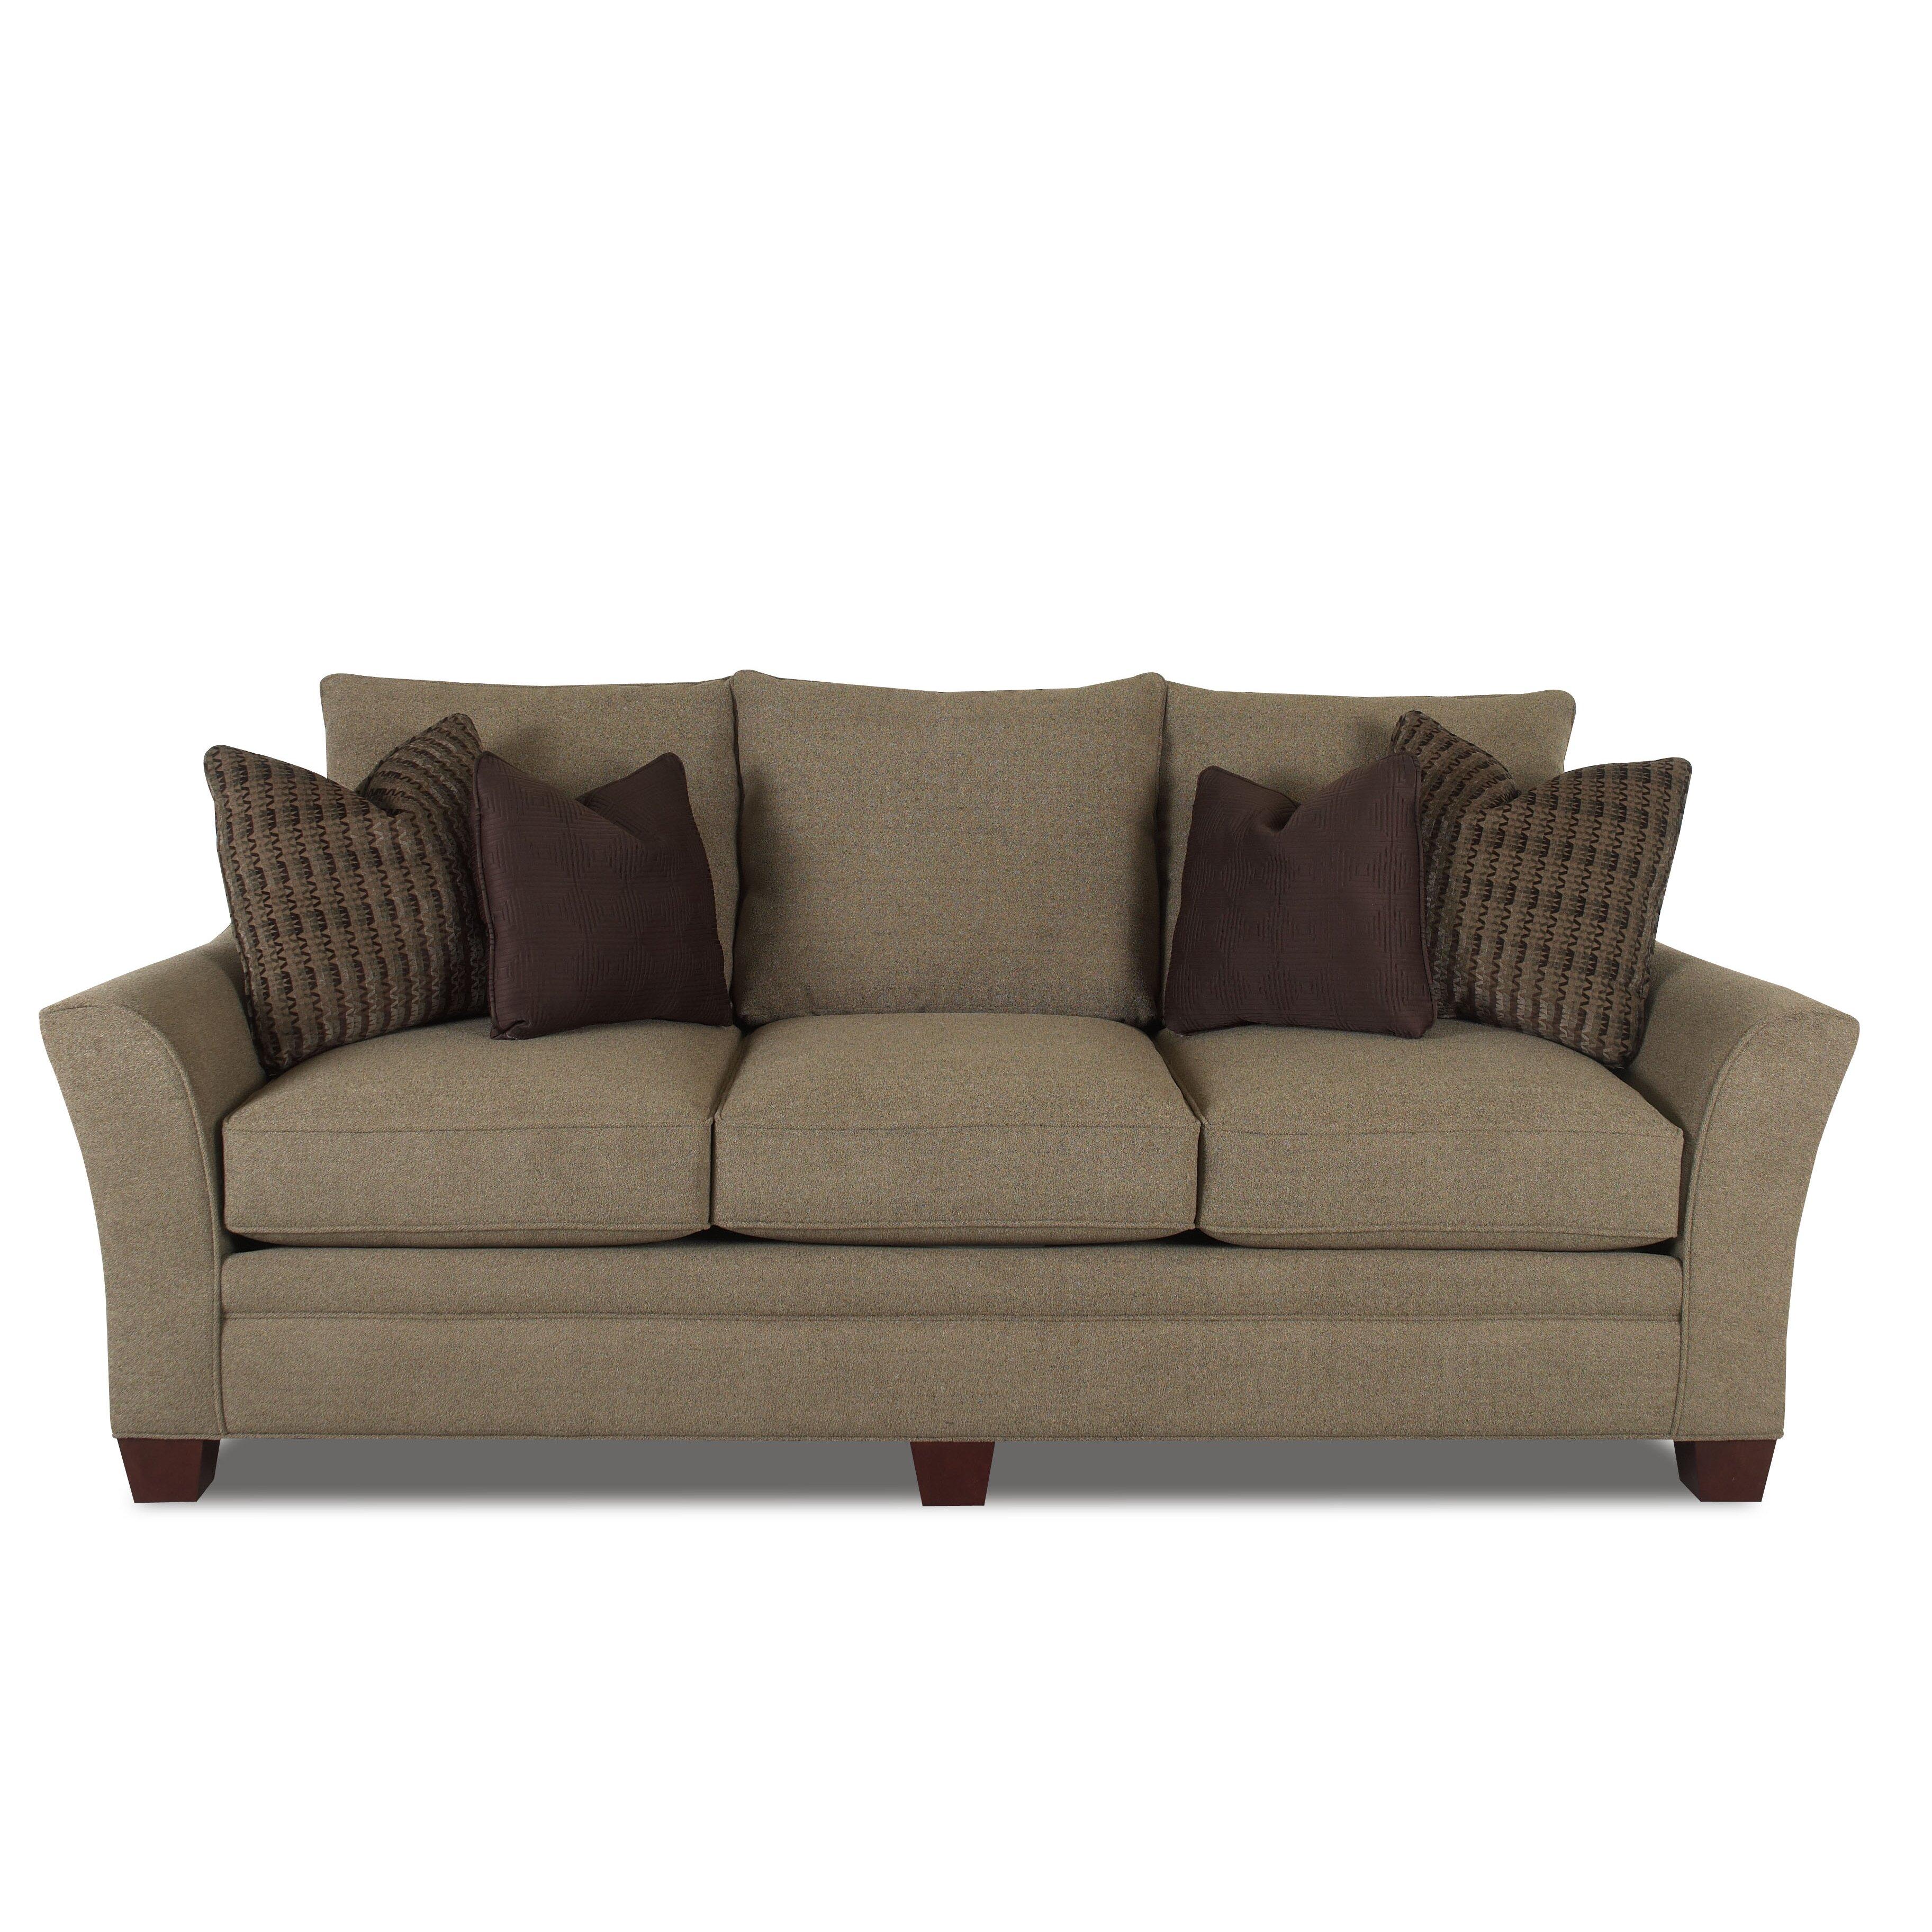 Flexsteel Everly Sofa: Klaussner Furniture Webster Sofa & Reviews